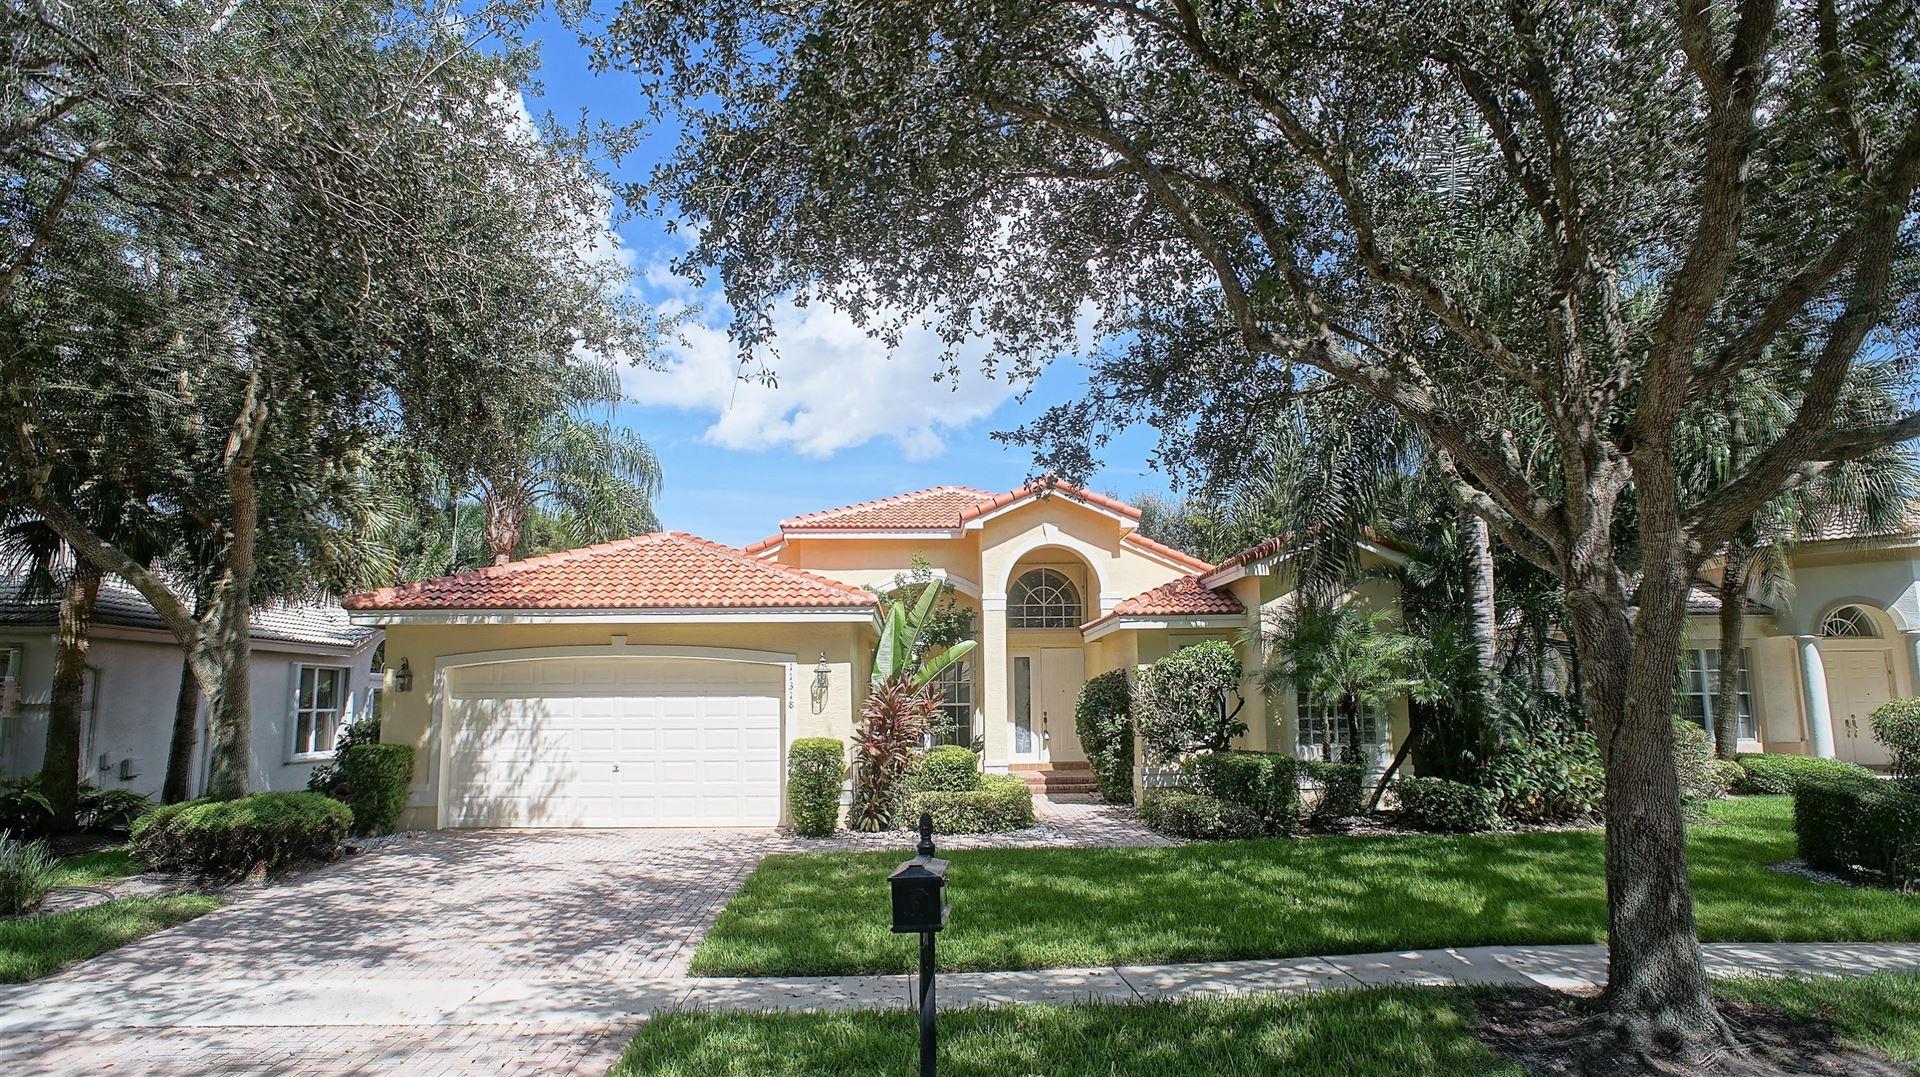 11318 Kona Court, Boynton Beach, FL 33437 - #: RX-10657038